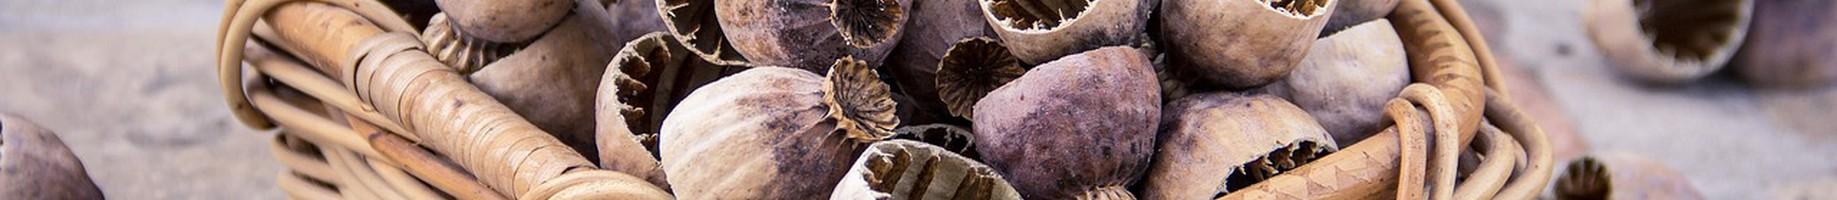 poppyseed-2557339_1280